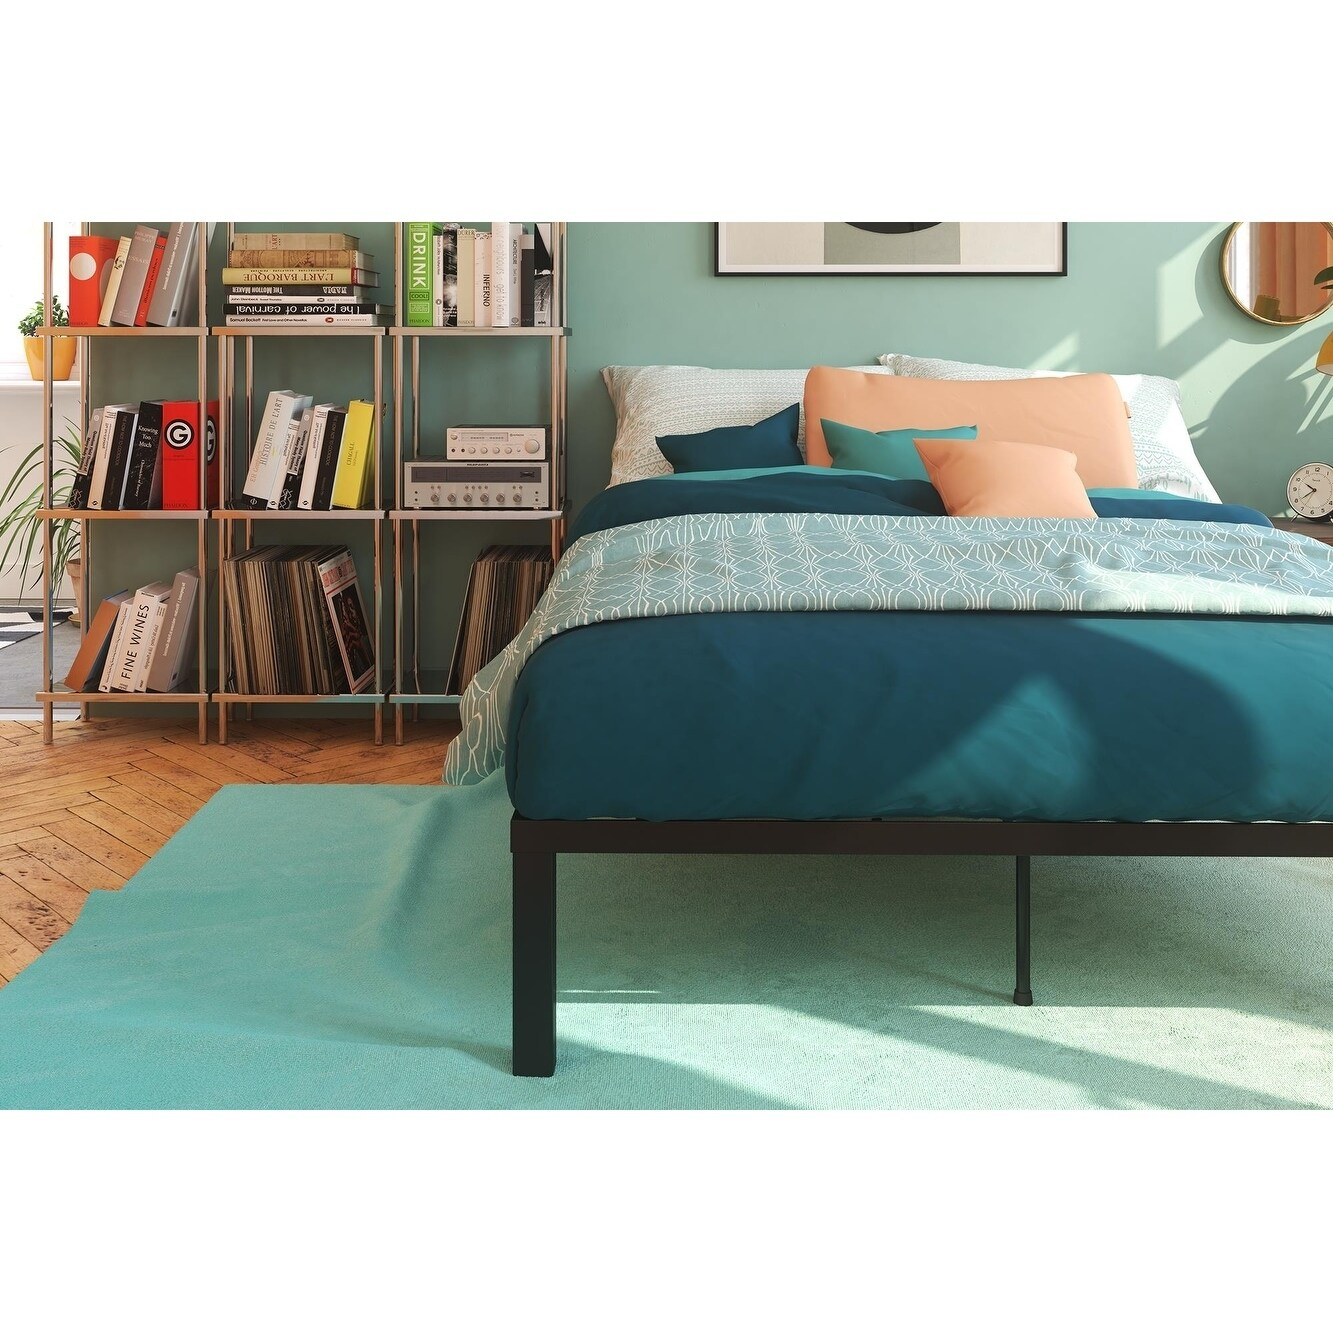 Shop Signature Sleep Black Modern Platform Bed With Euro Wood Slats